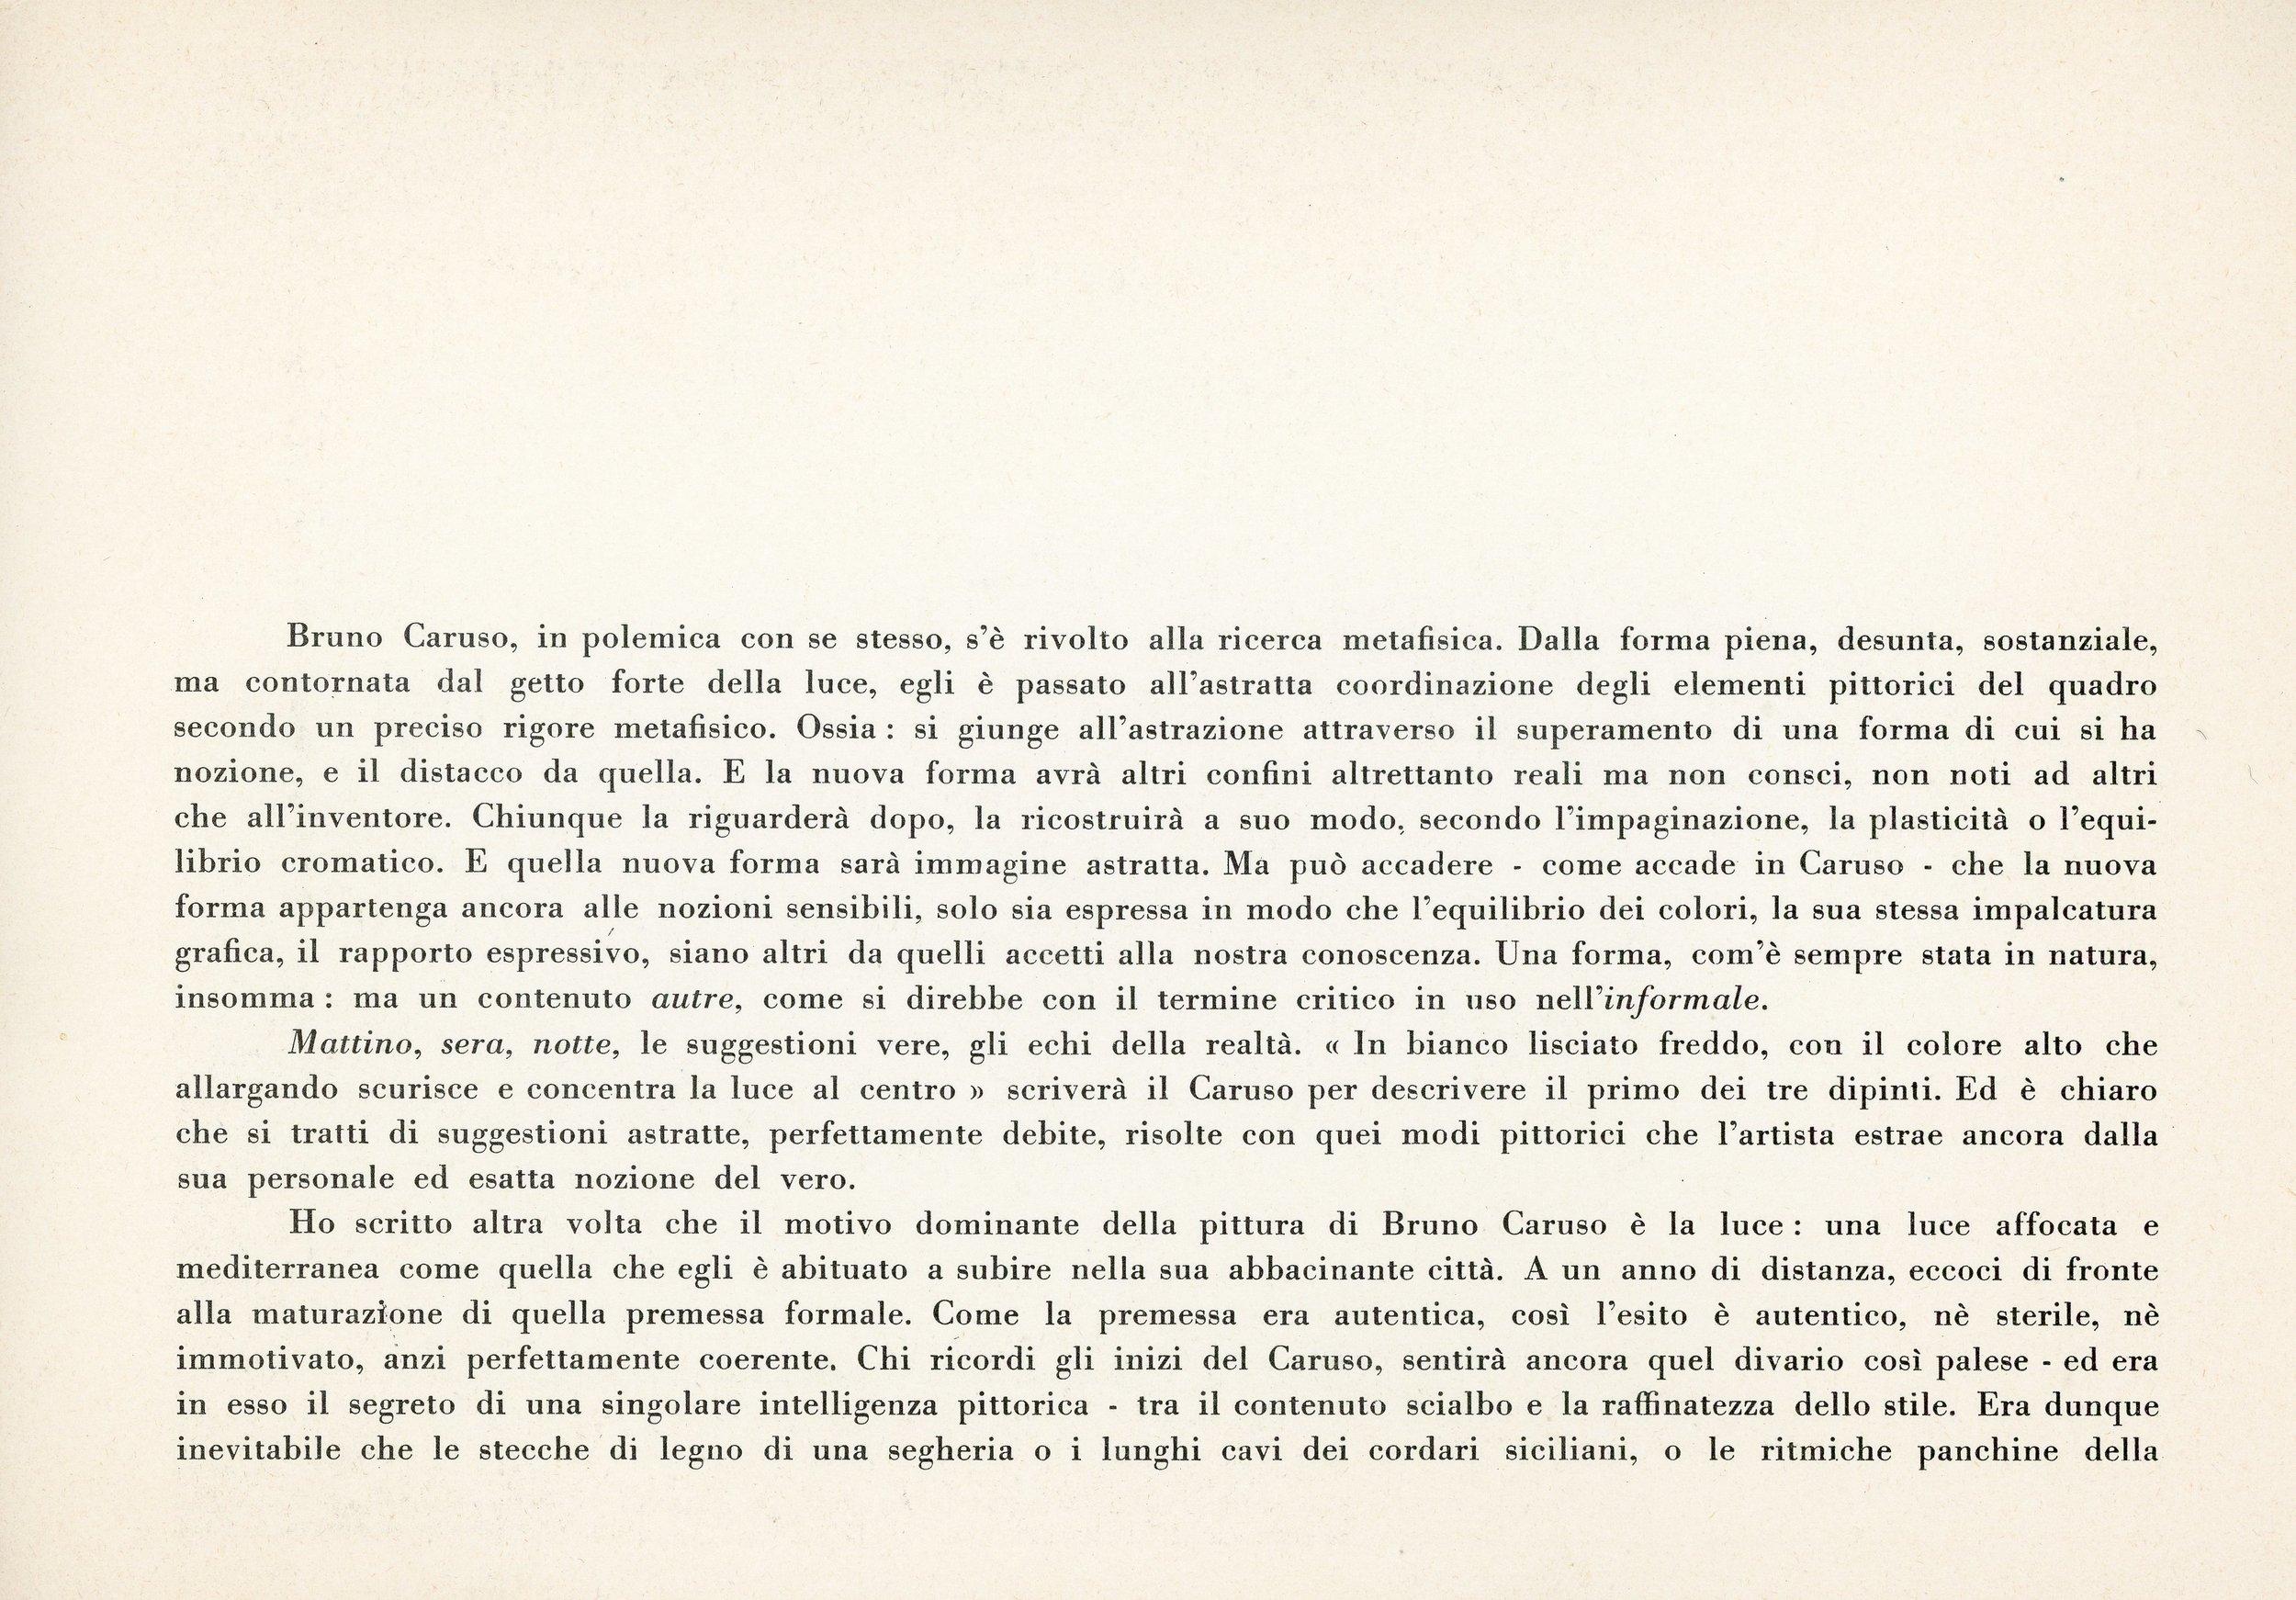 1958-06 Obelisco - Bruno Caruso_02.jpg